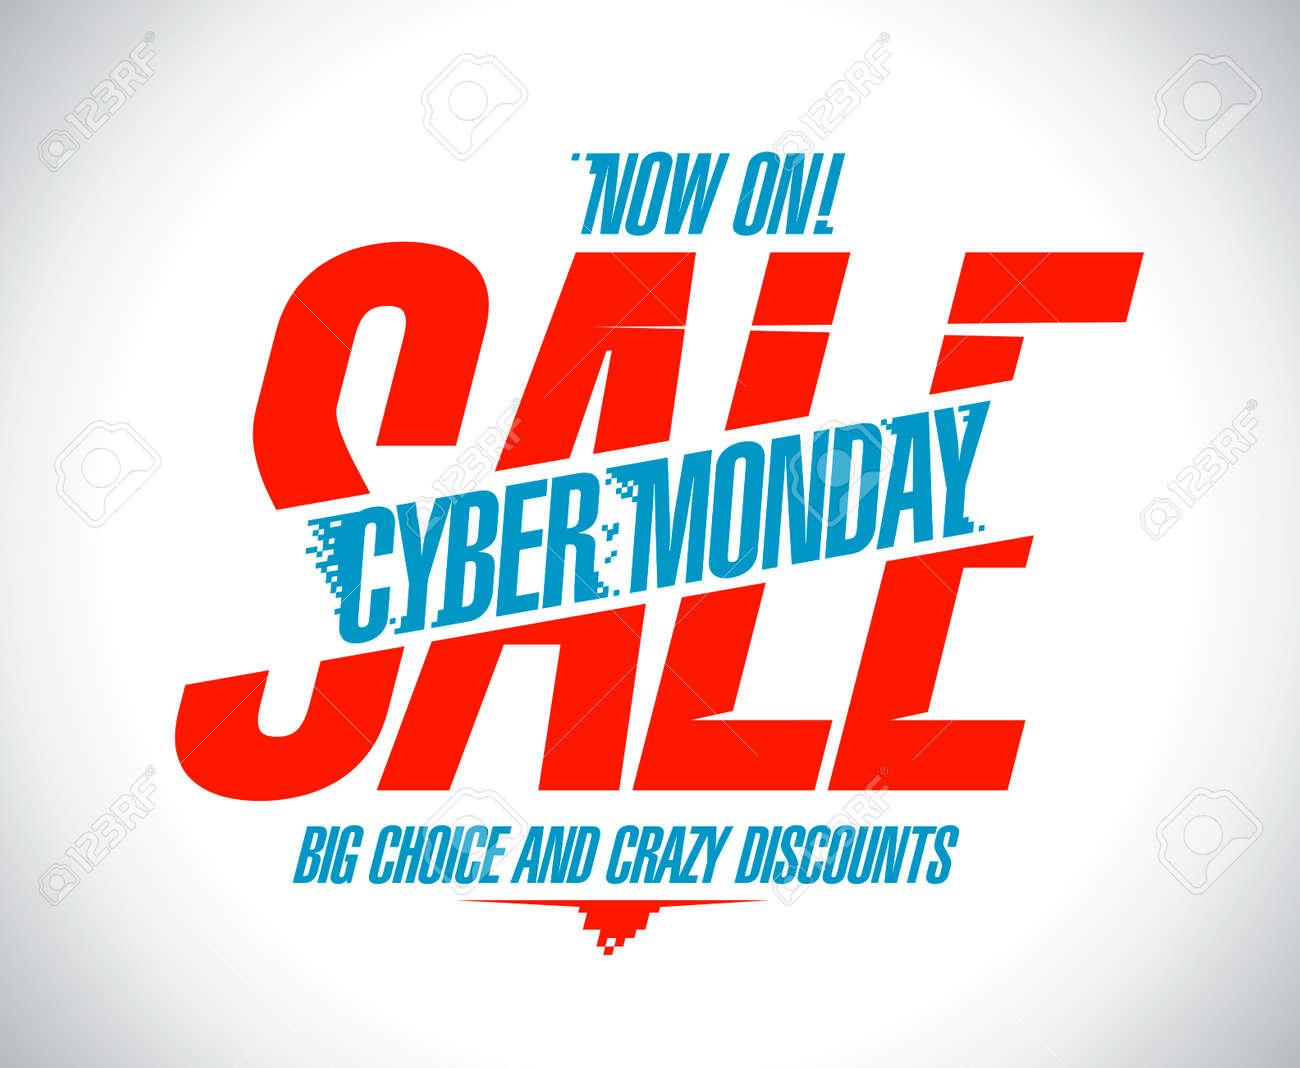 06a0b9b831a Cyber monday sale design, crazy discounts.